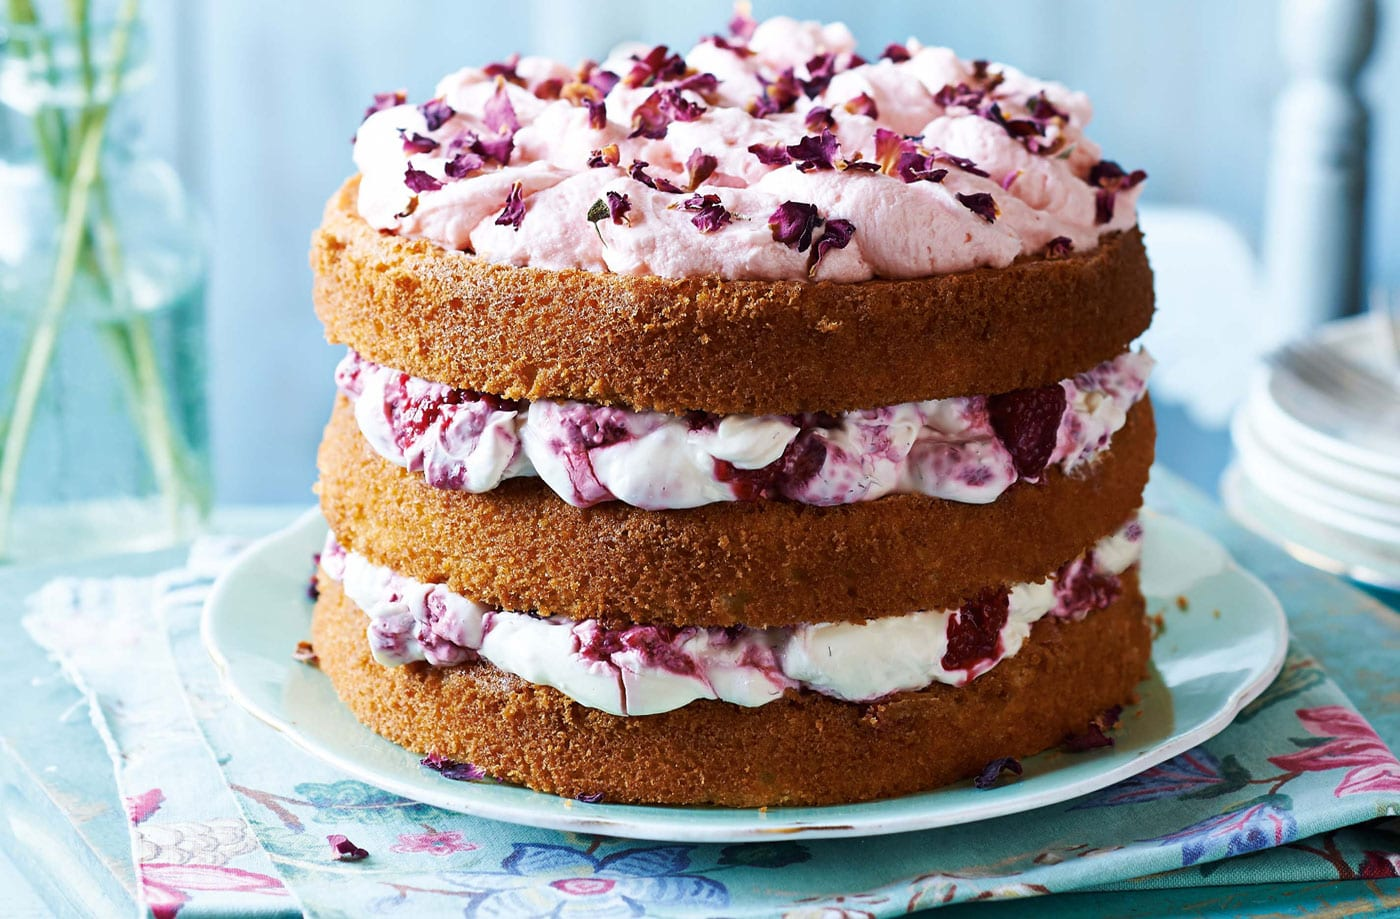 Tesco Cake Recipes Uk: Tesco-baking-cake-main